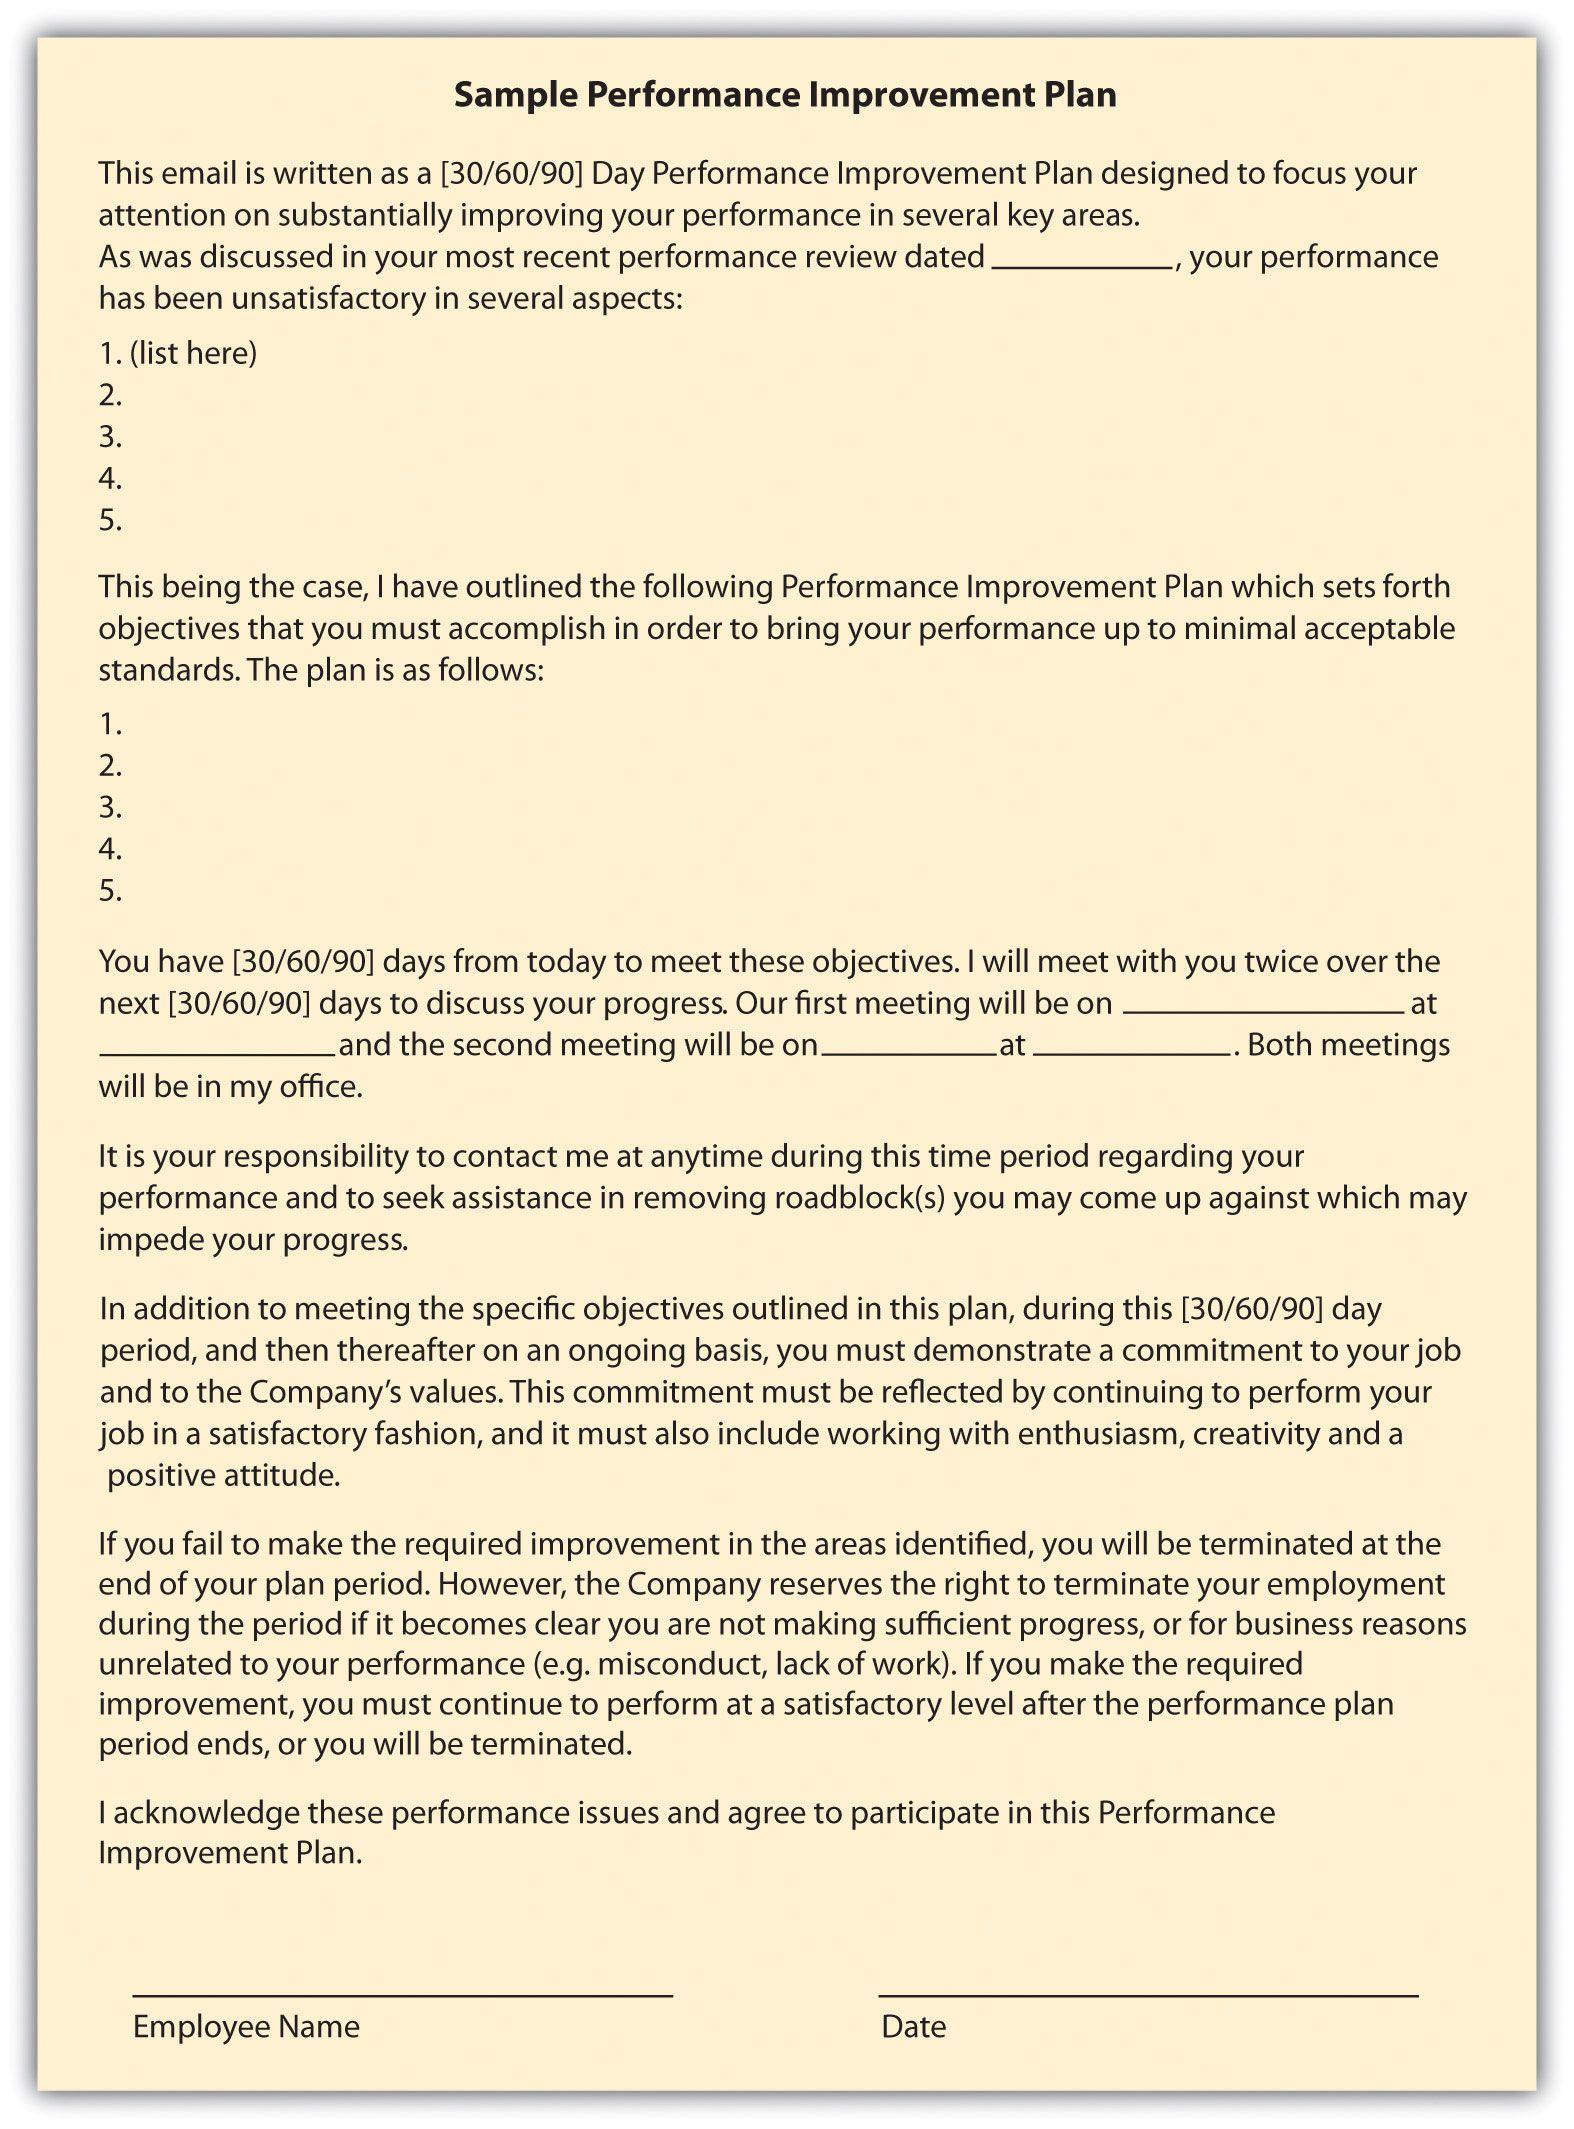 002 handling performance human resource management sample